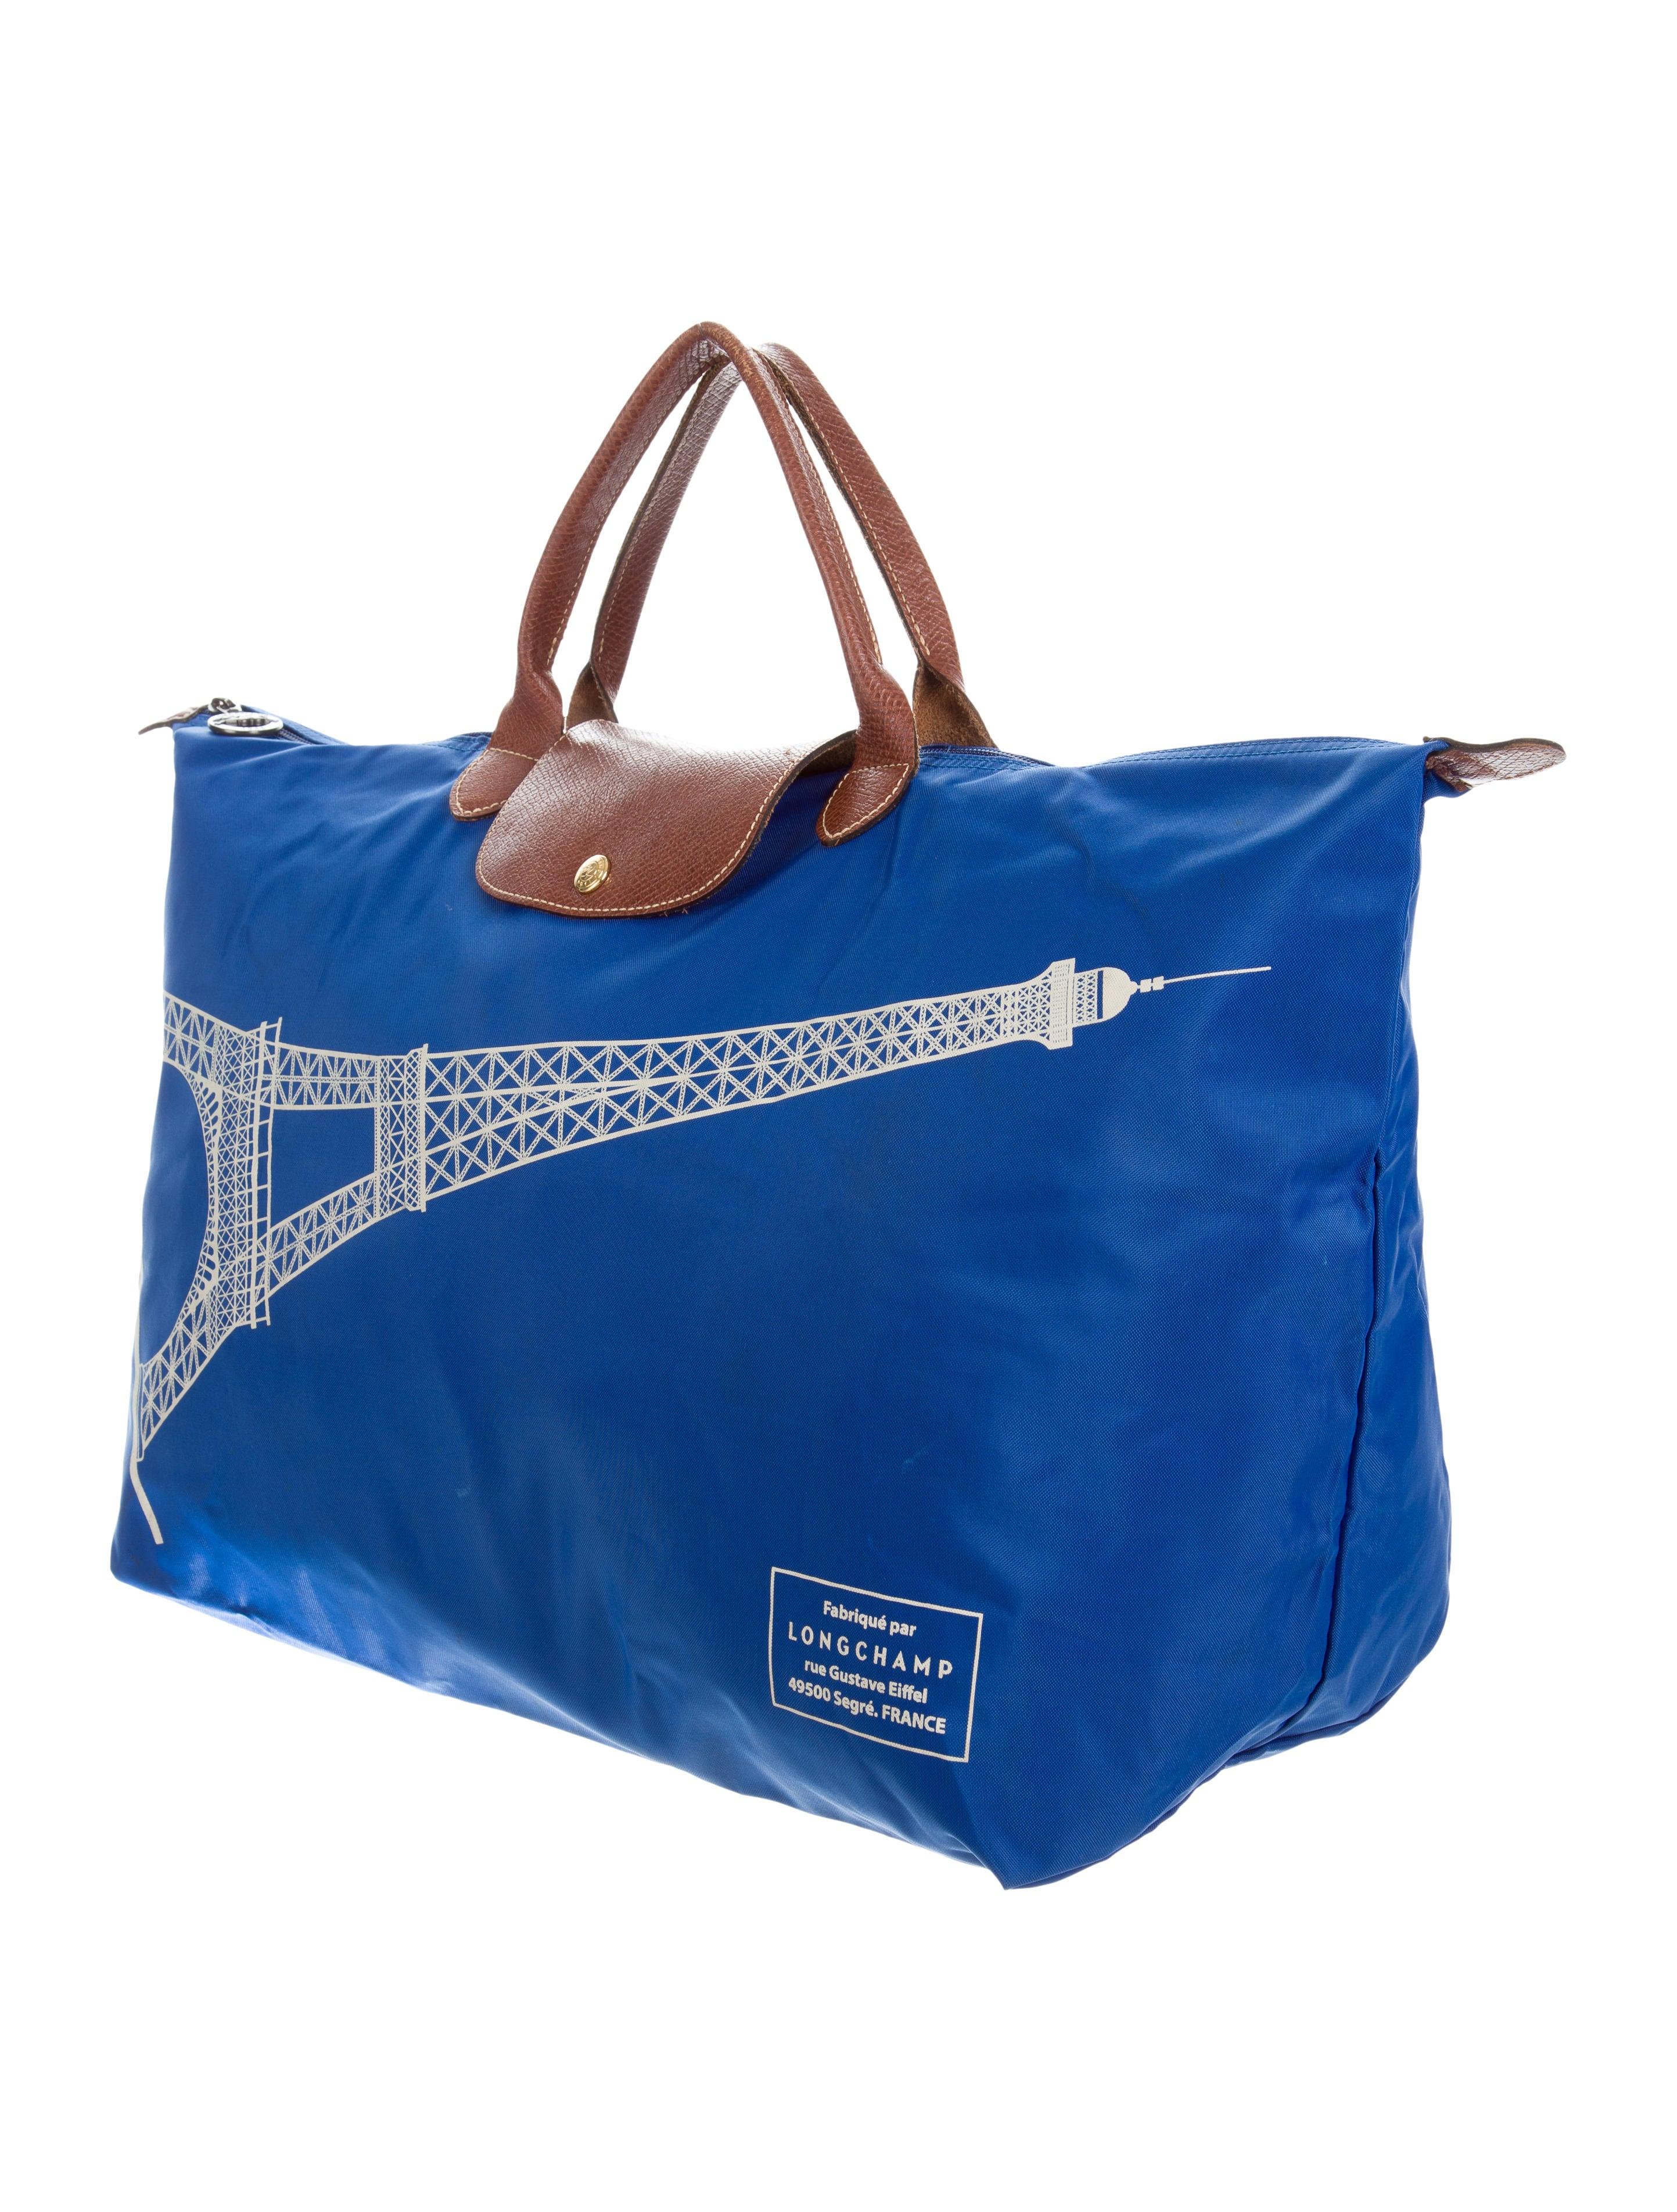 Longchamp Eiffel Laukku : Longchamp eiffel tower le pliage tote handbags